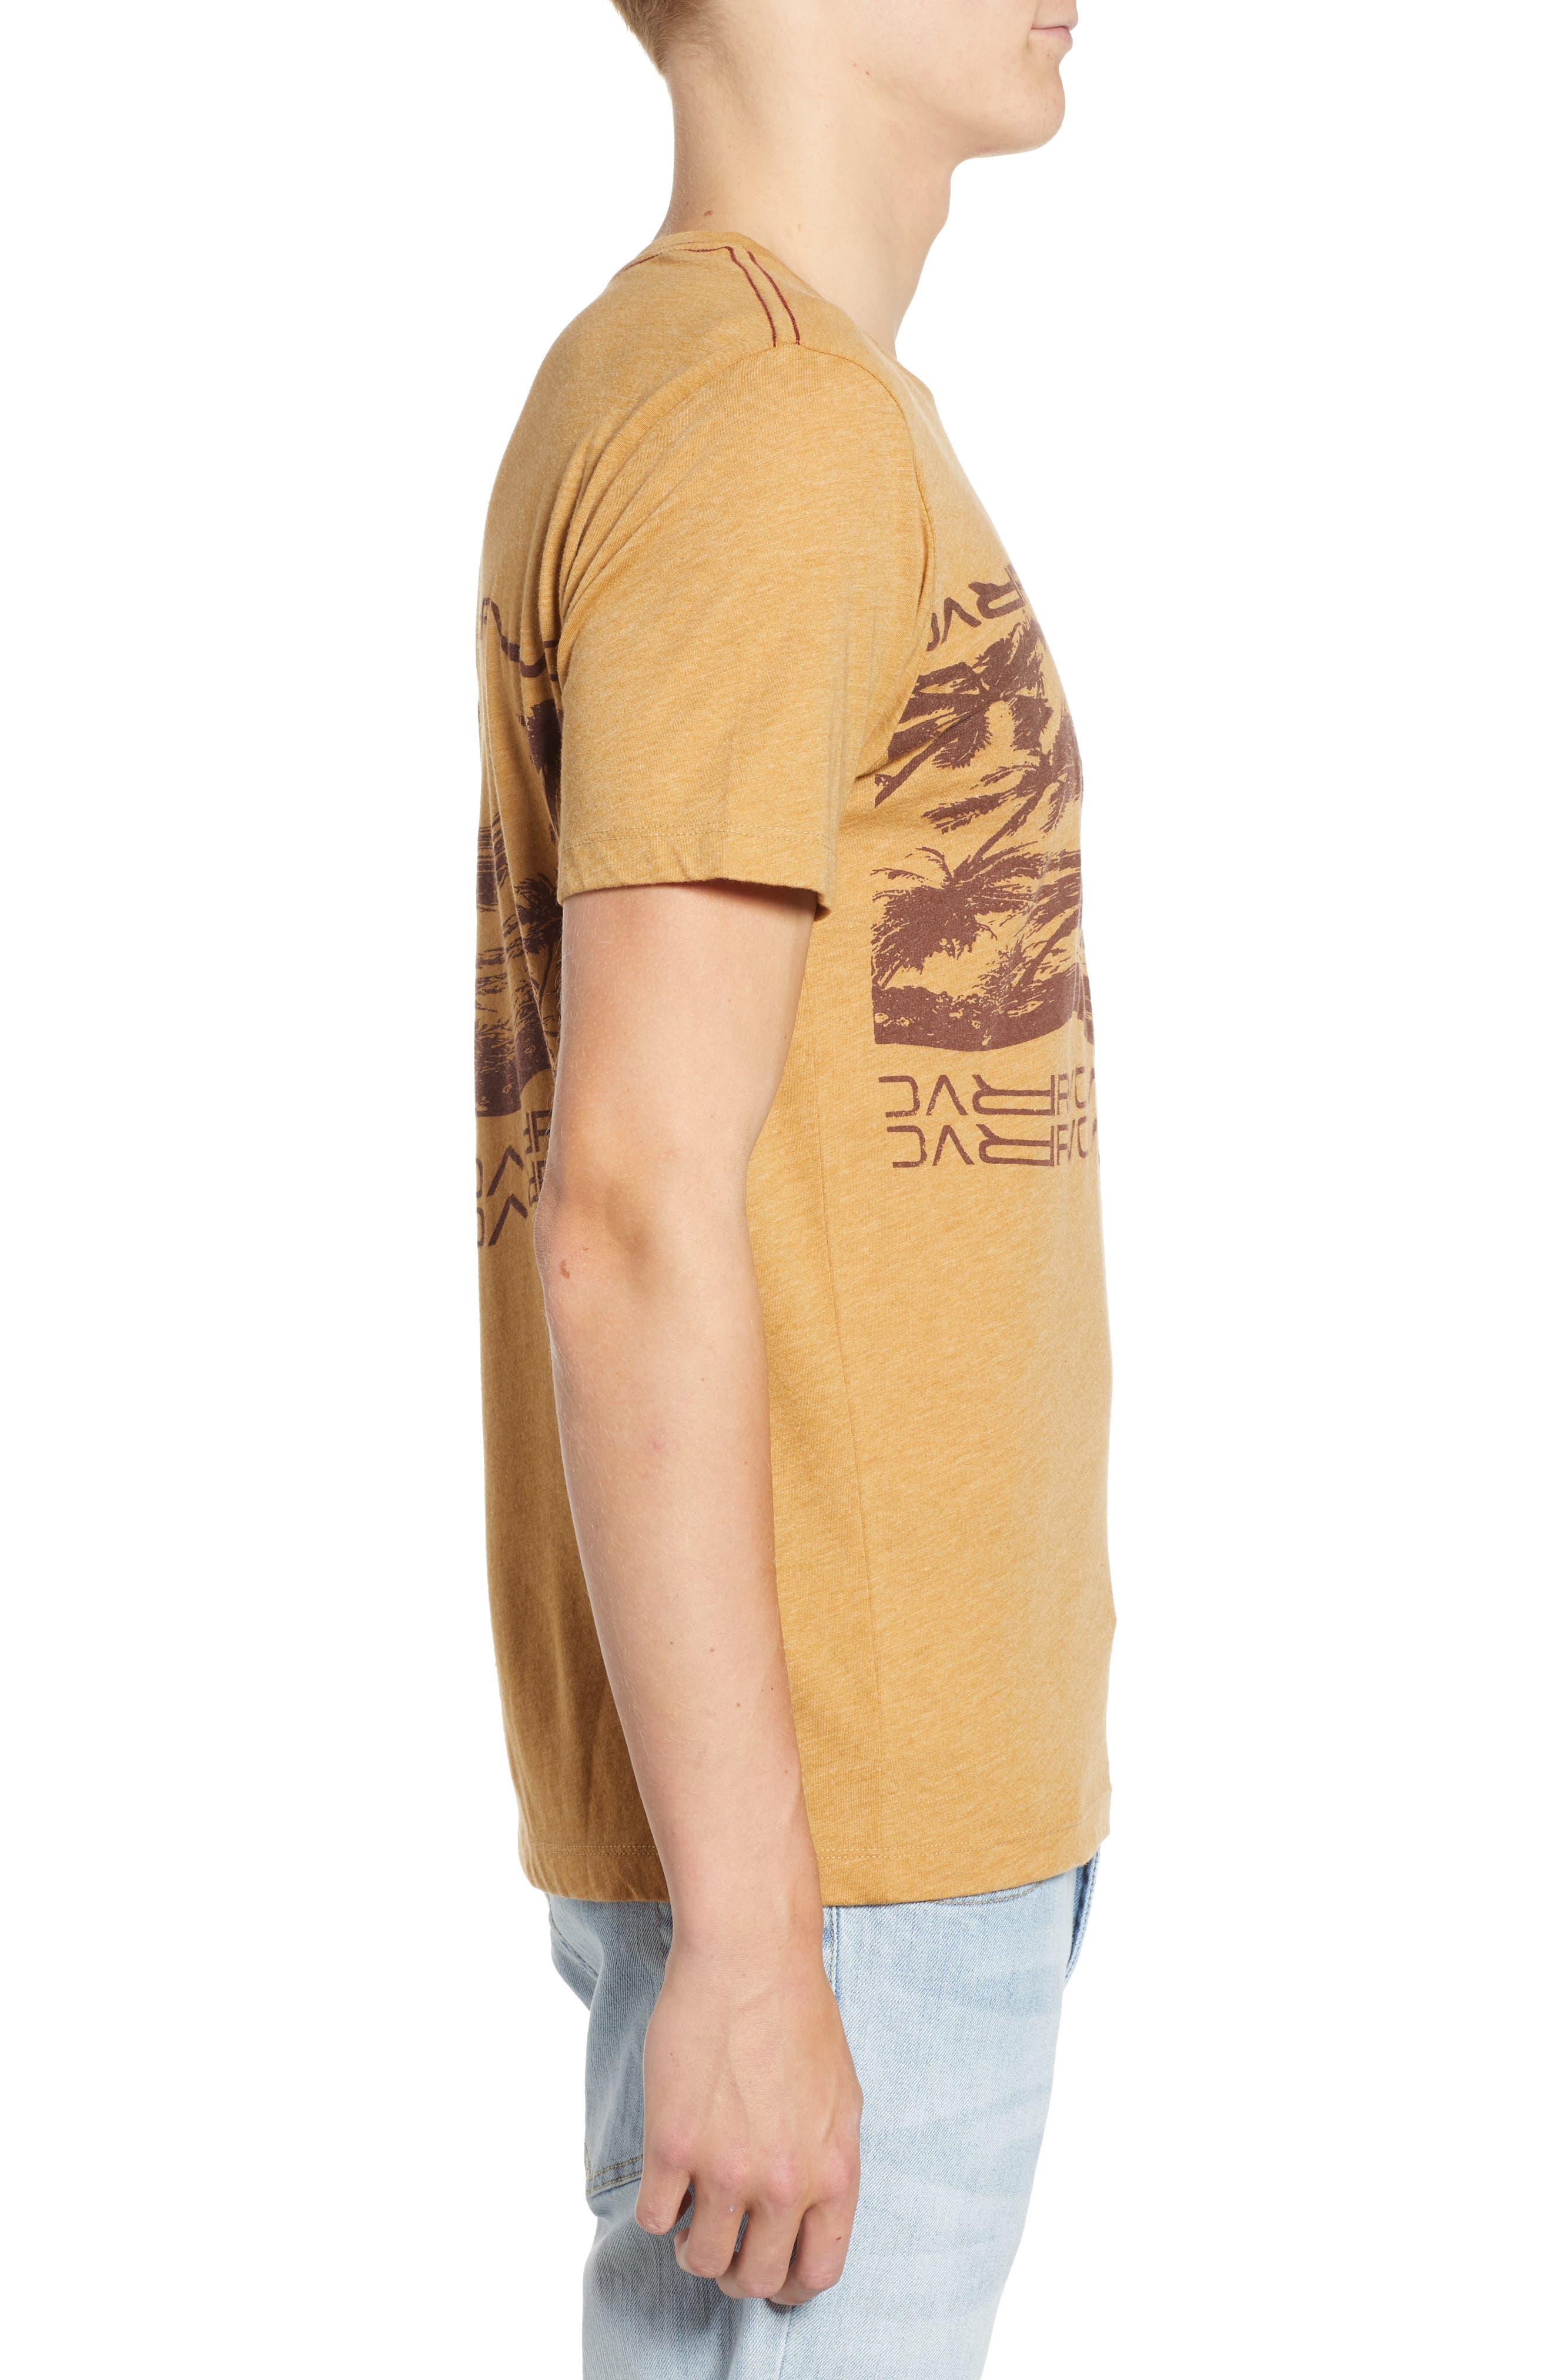 Warped Palm Graphic T-Shirt,                             Alternate thumbnail 3, color,                             APPLE CINNAMON